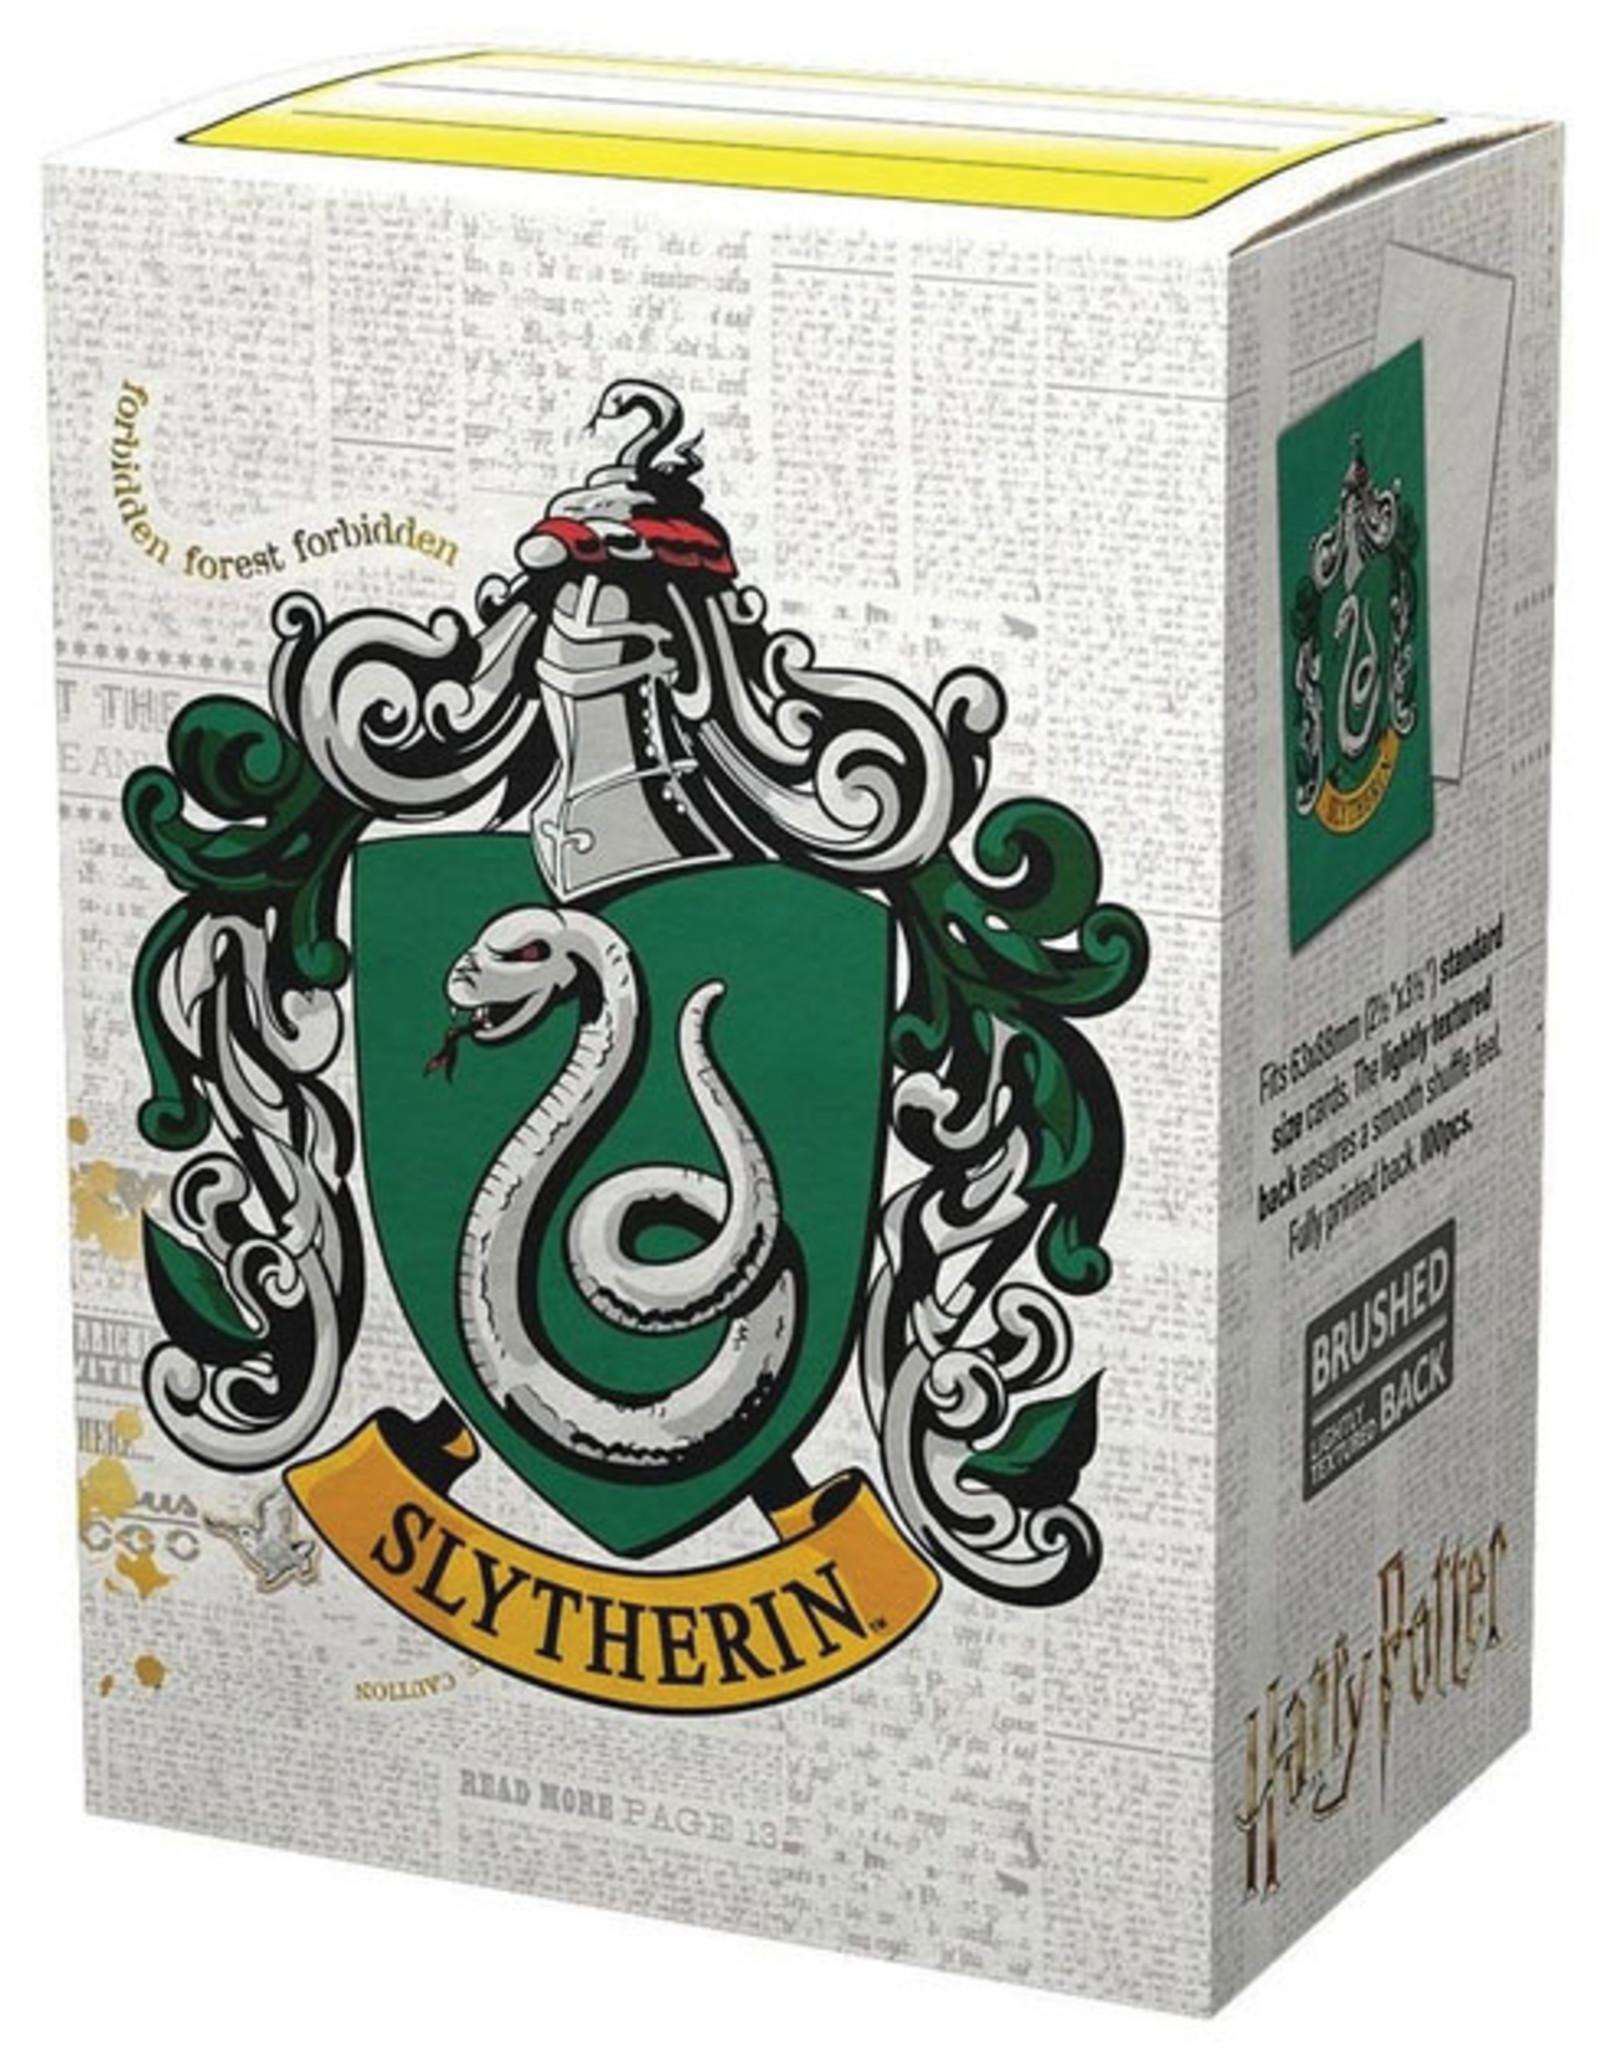 Arcane Tinmen Dragon Shields: (100) Brushed Art - Harry Potter Wizarding World - Slytherin